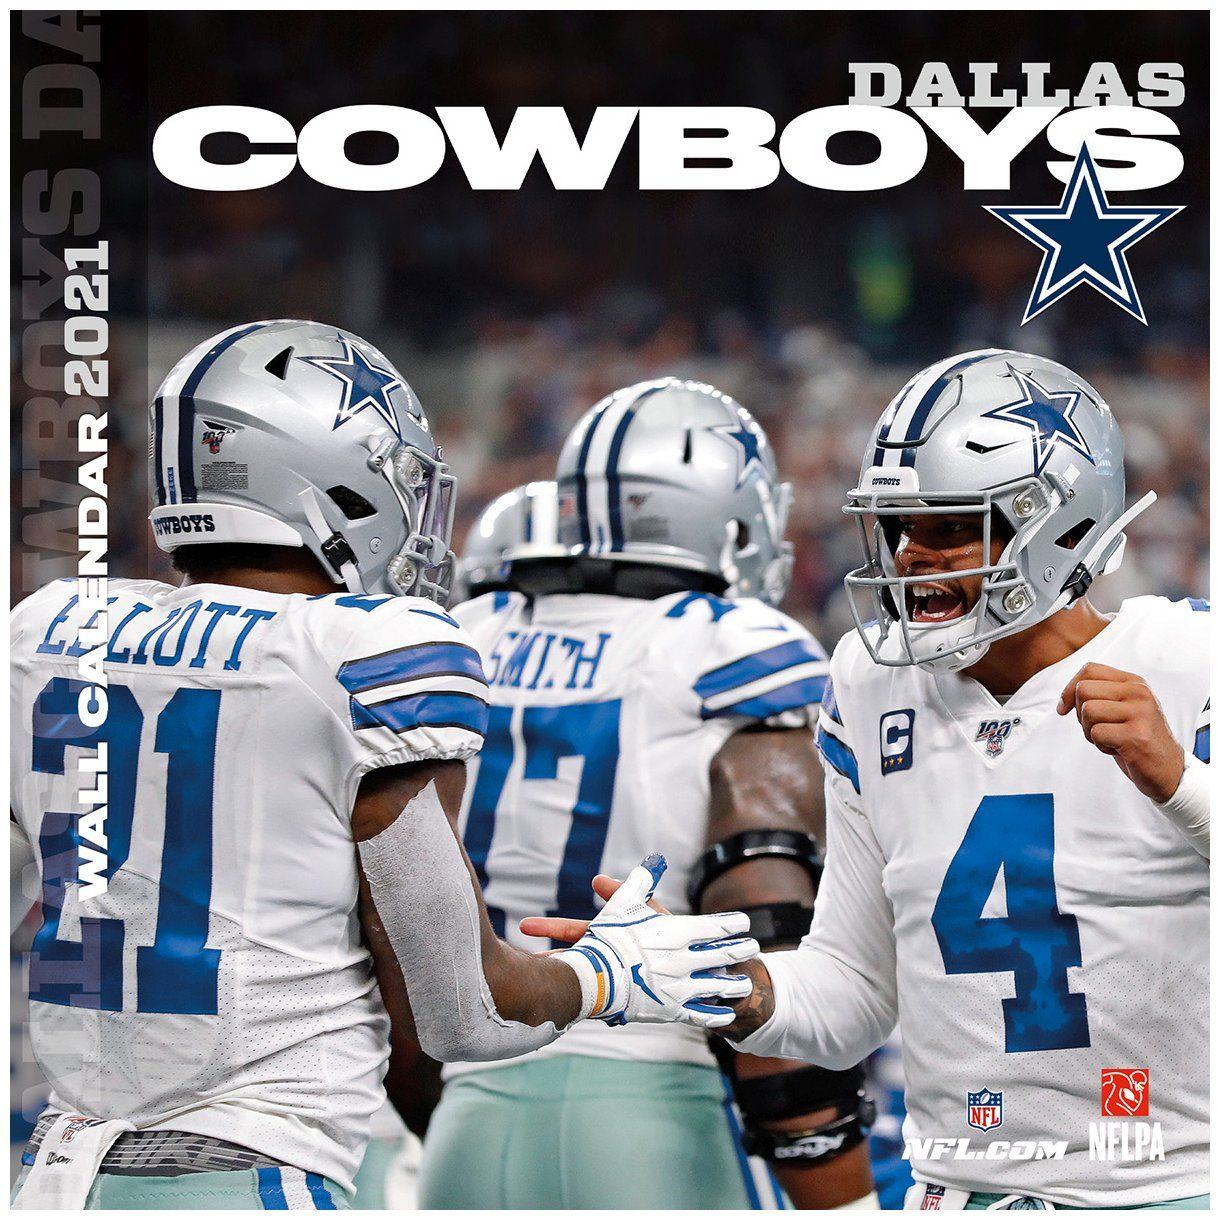 amfoo - Turner NFL 30x30cm Wand-Kalender 2021 Dallas Cowboys